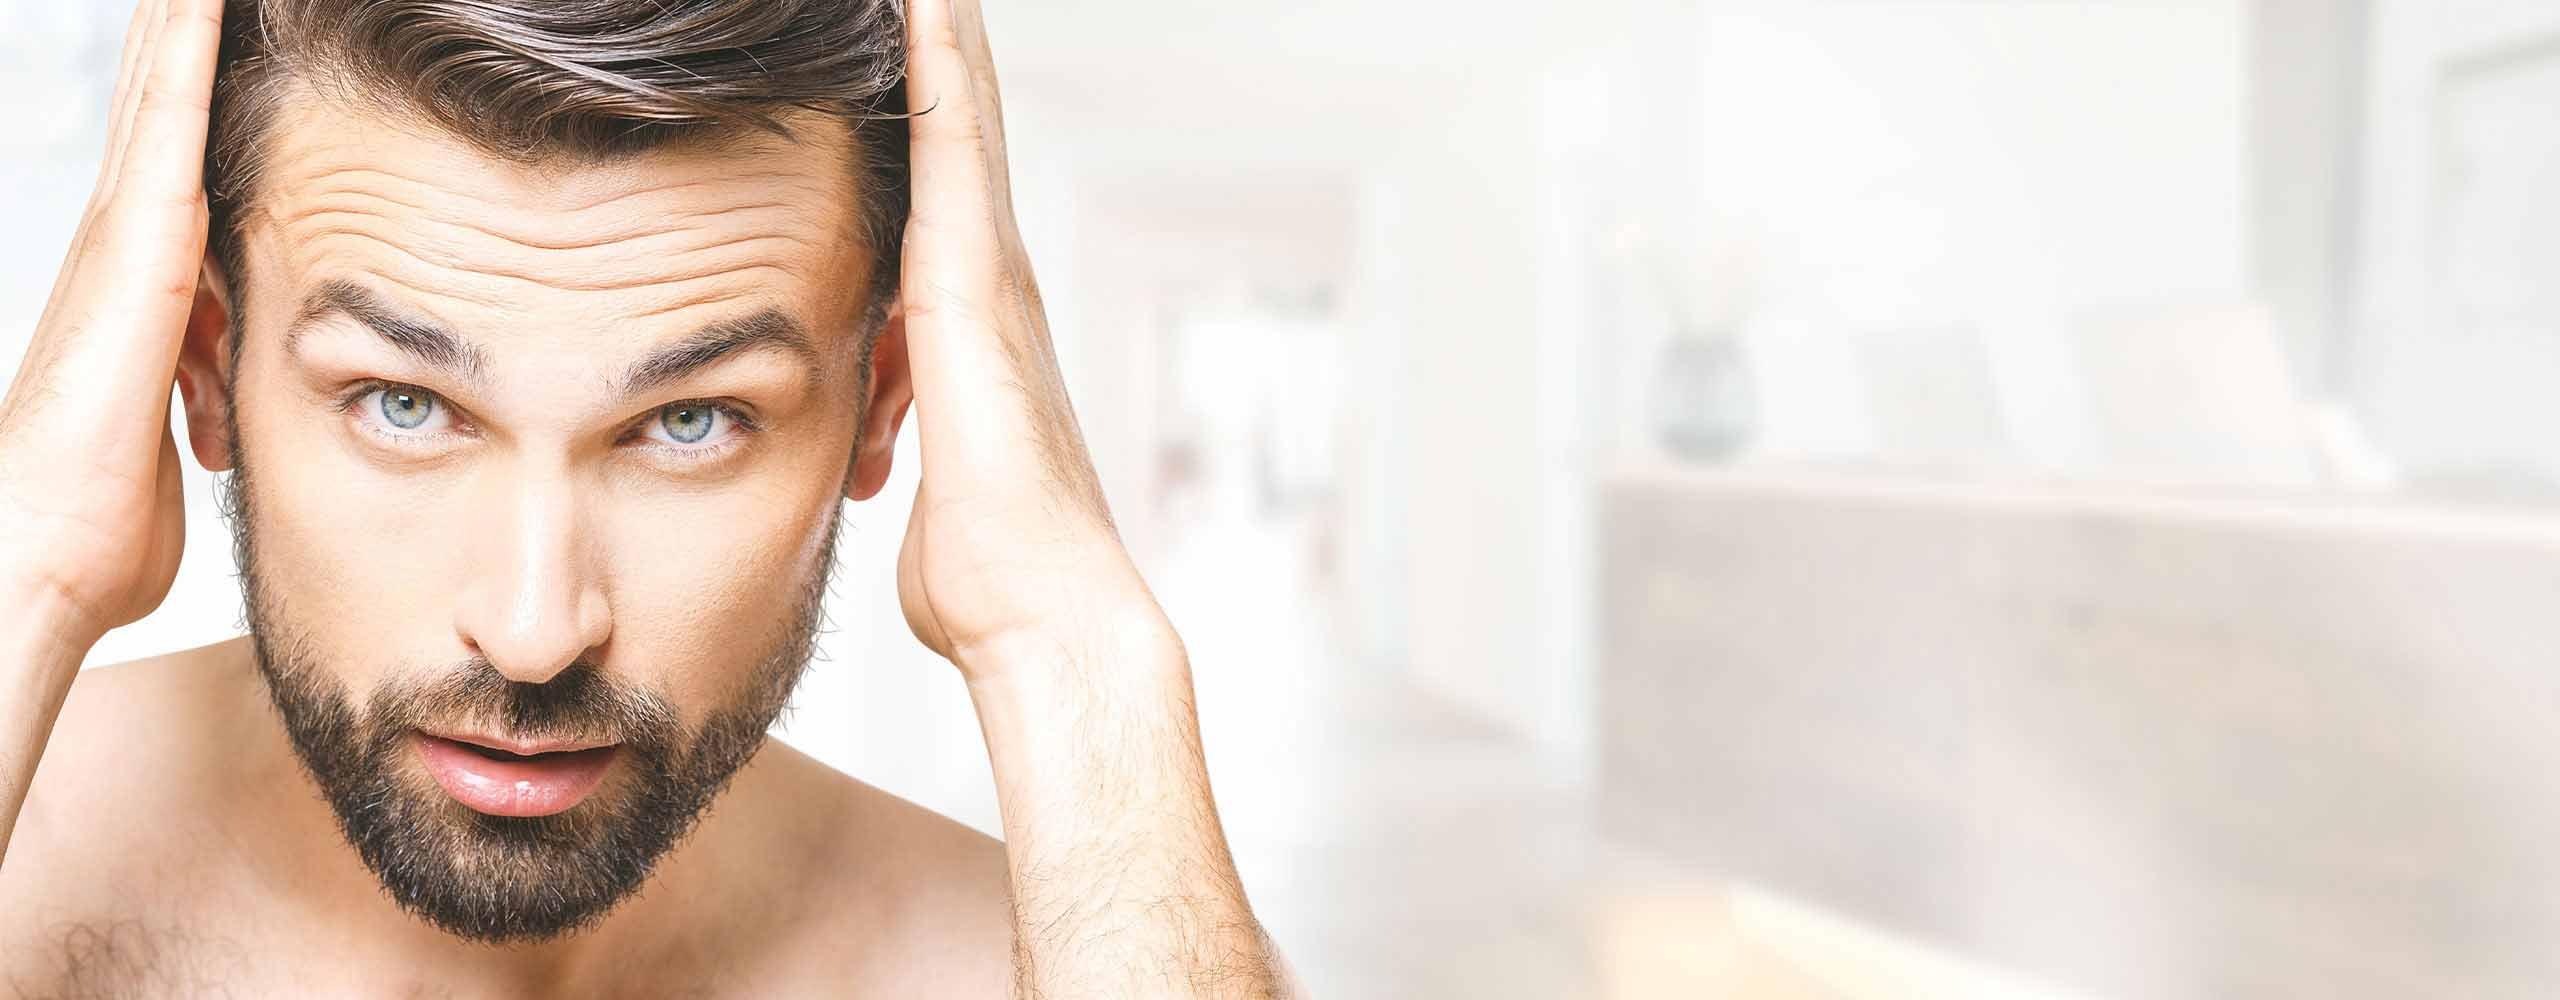 proaesthetic heidelberg schoenheitsklinik header 2